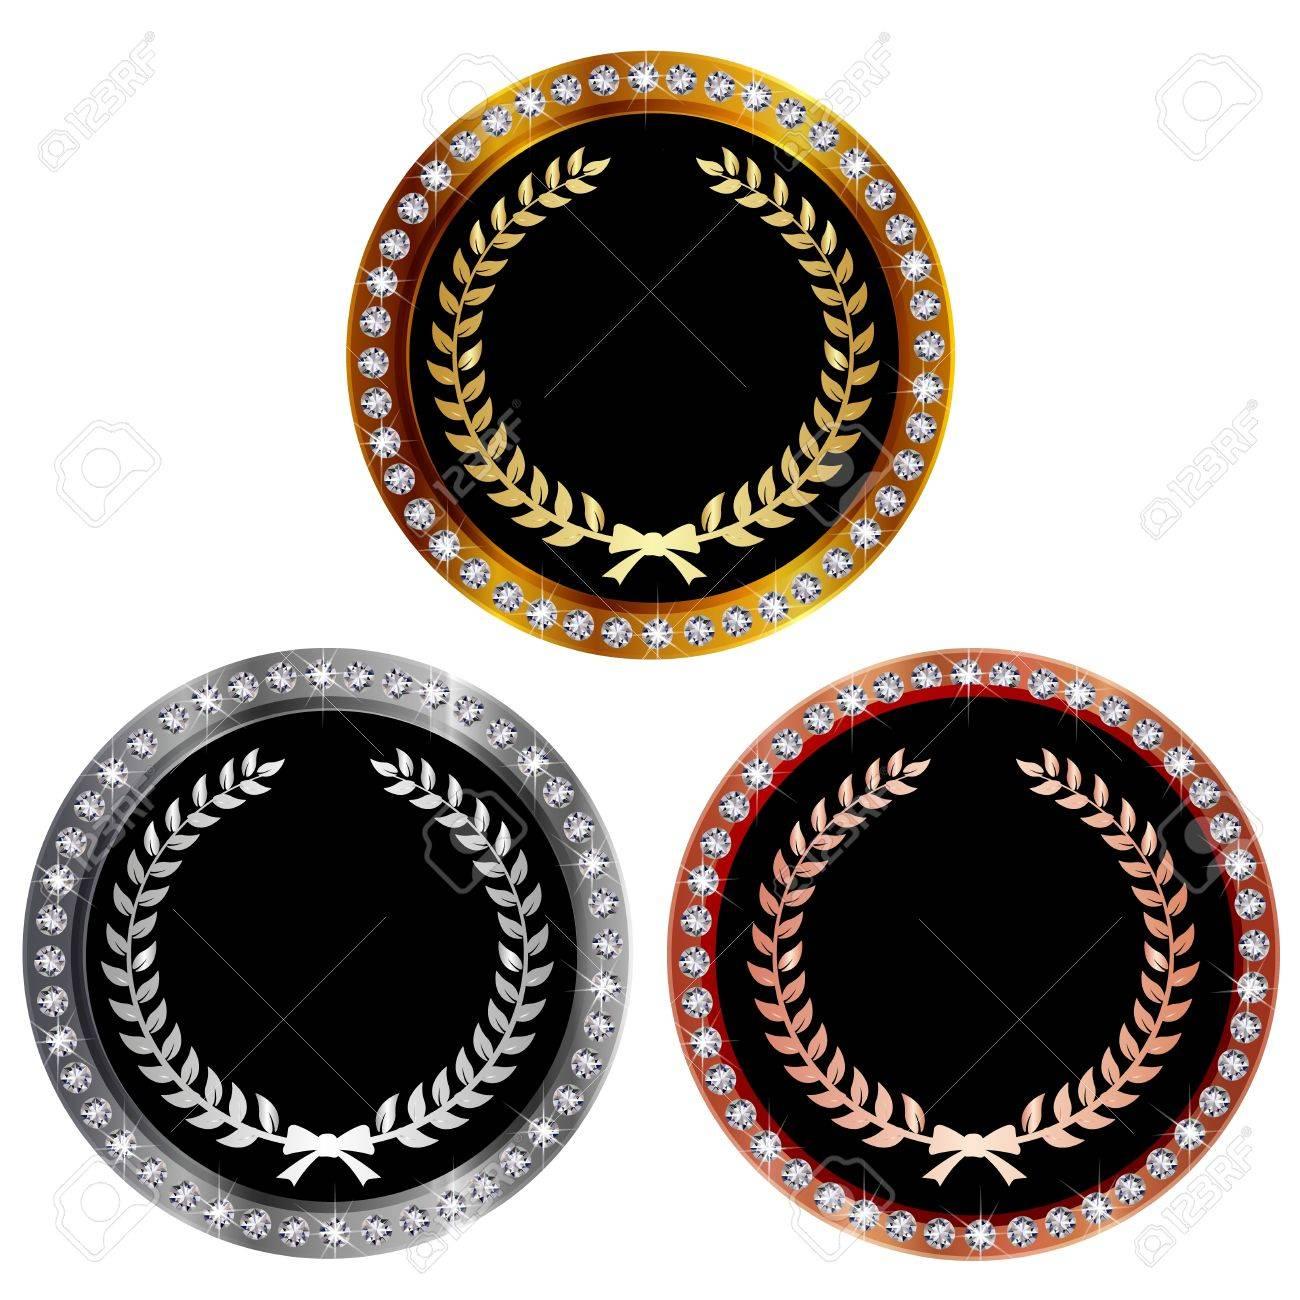 medal Stock Vector - 15974749